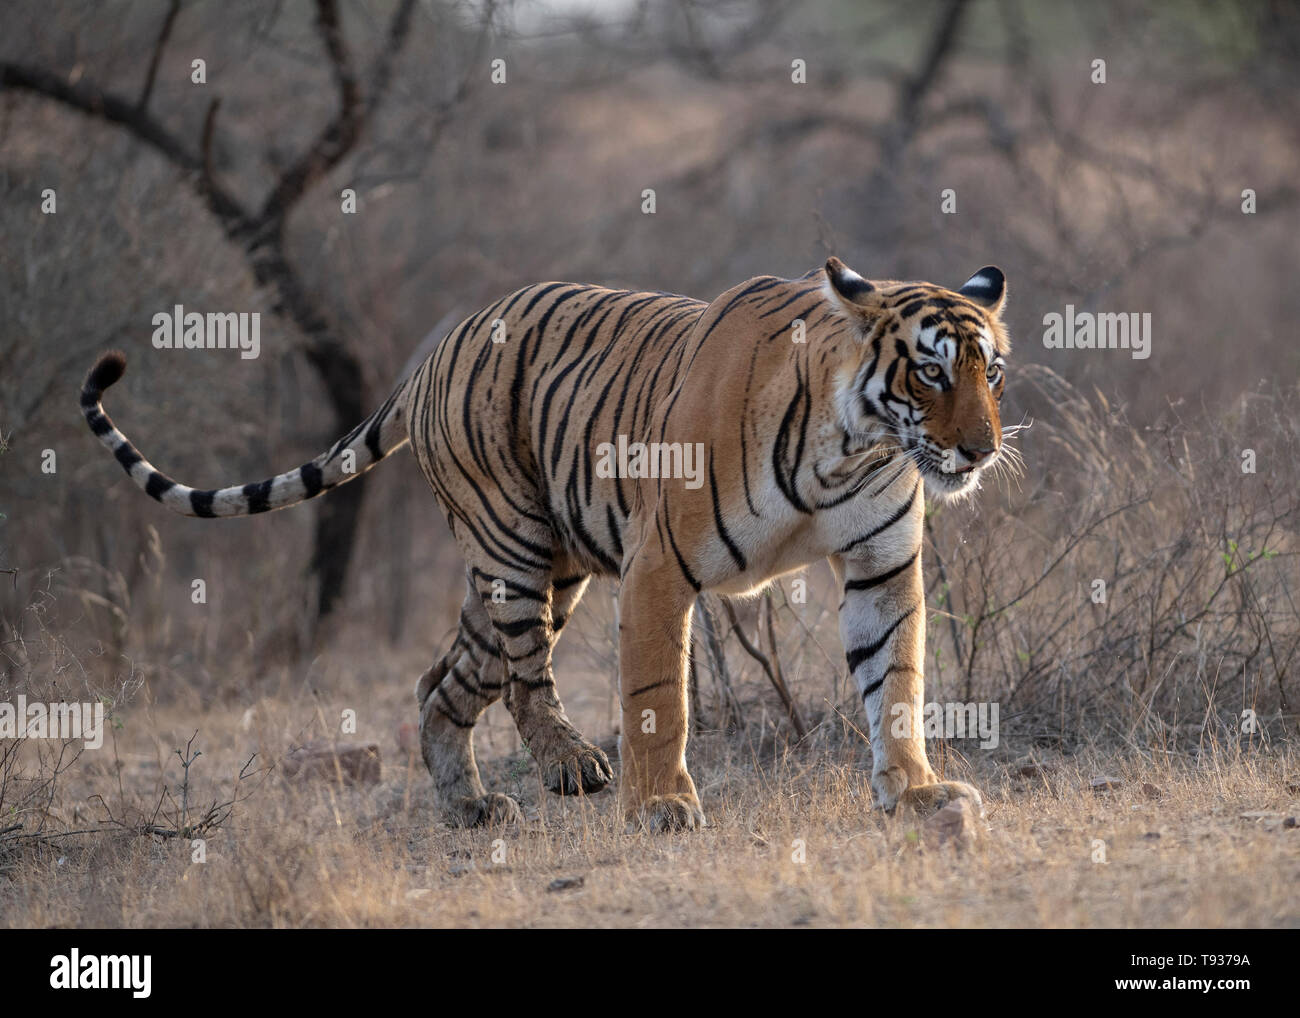 Tigress T-84 Arrowhead - Stock Image